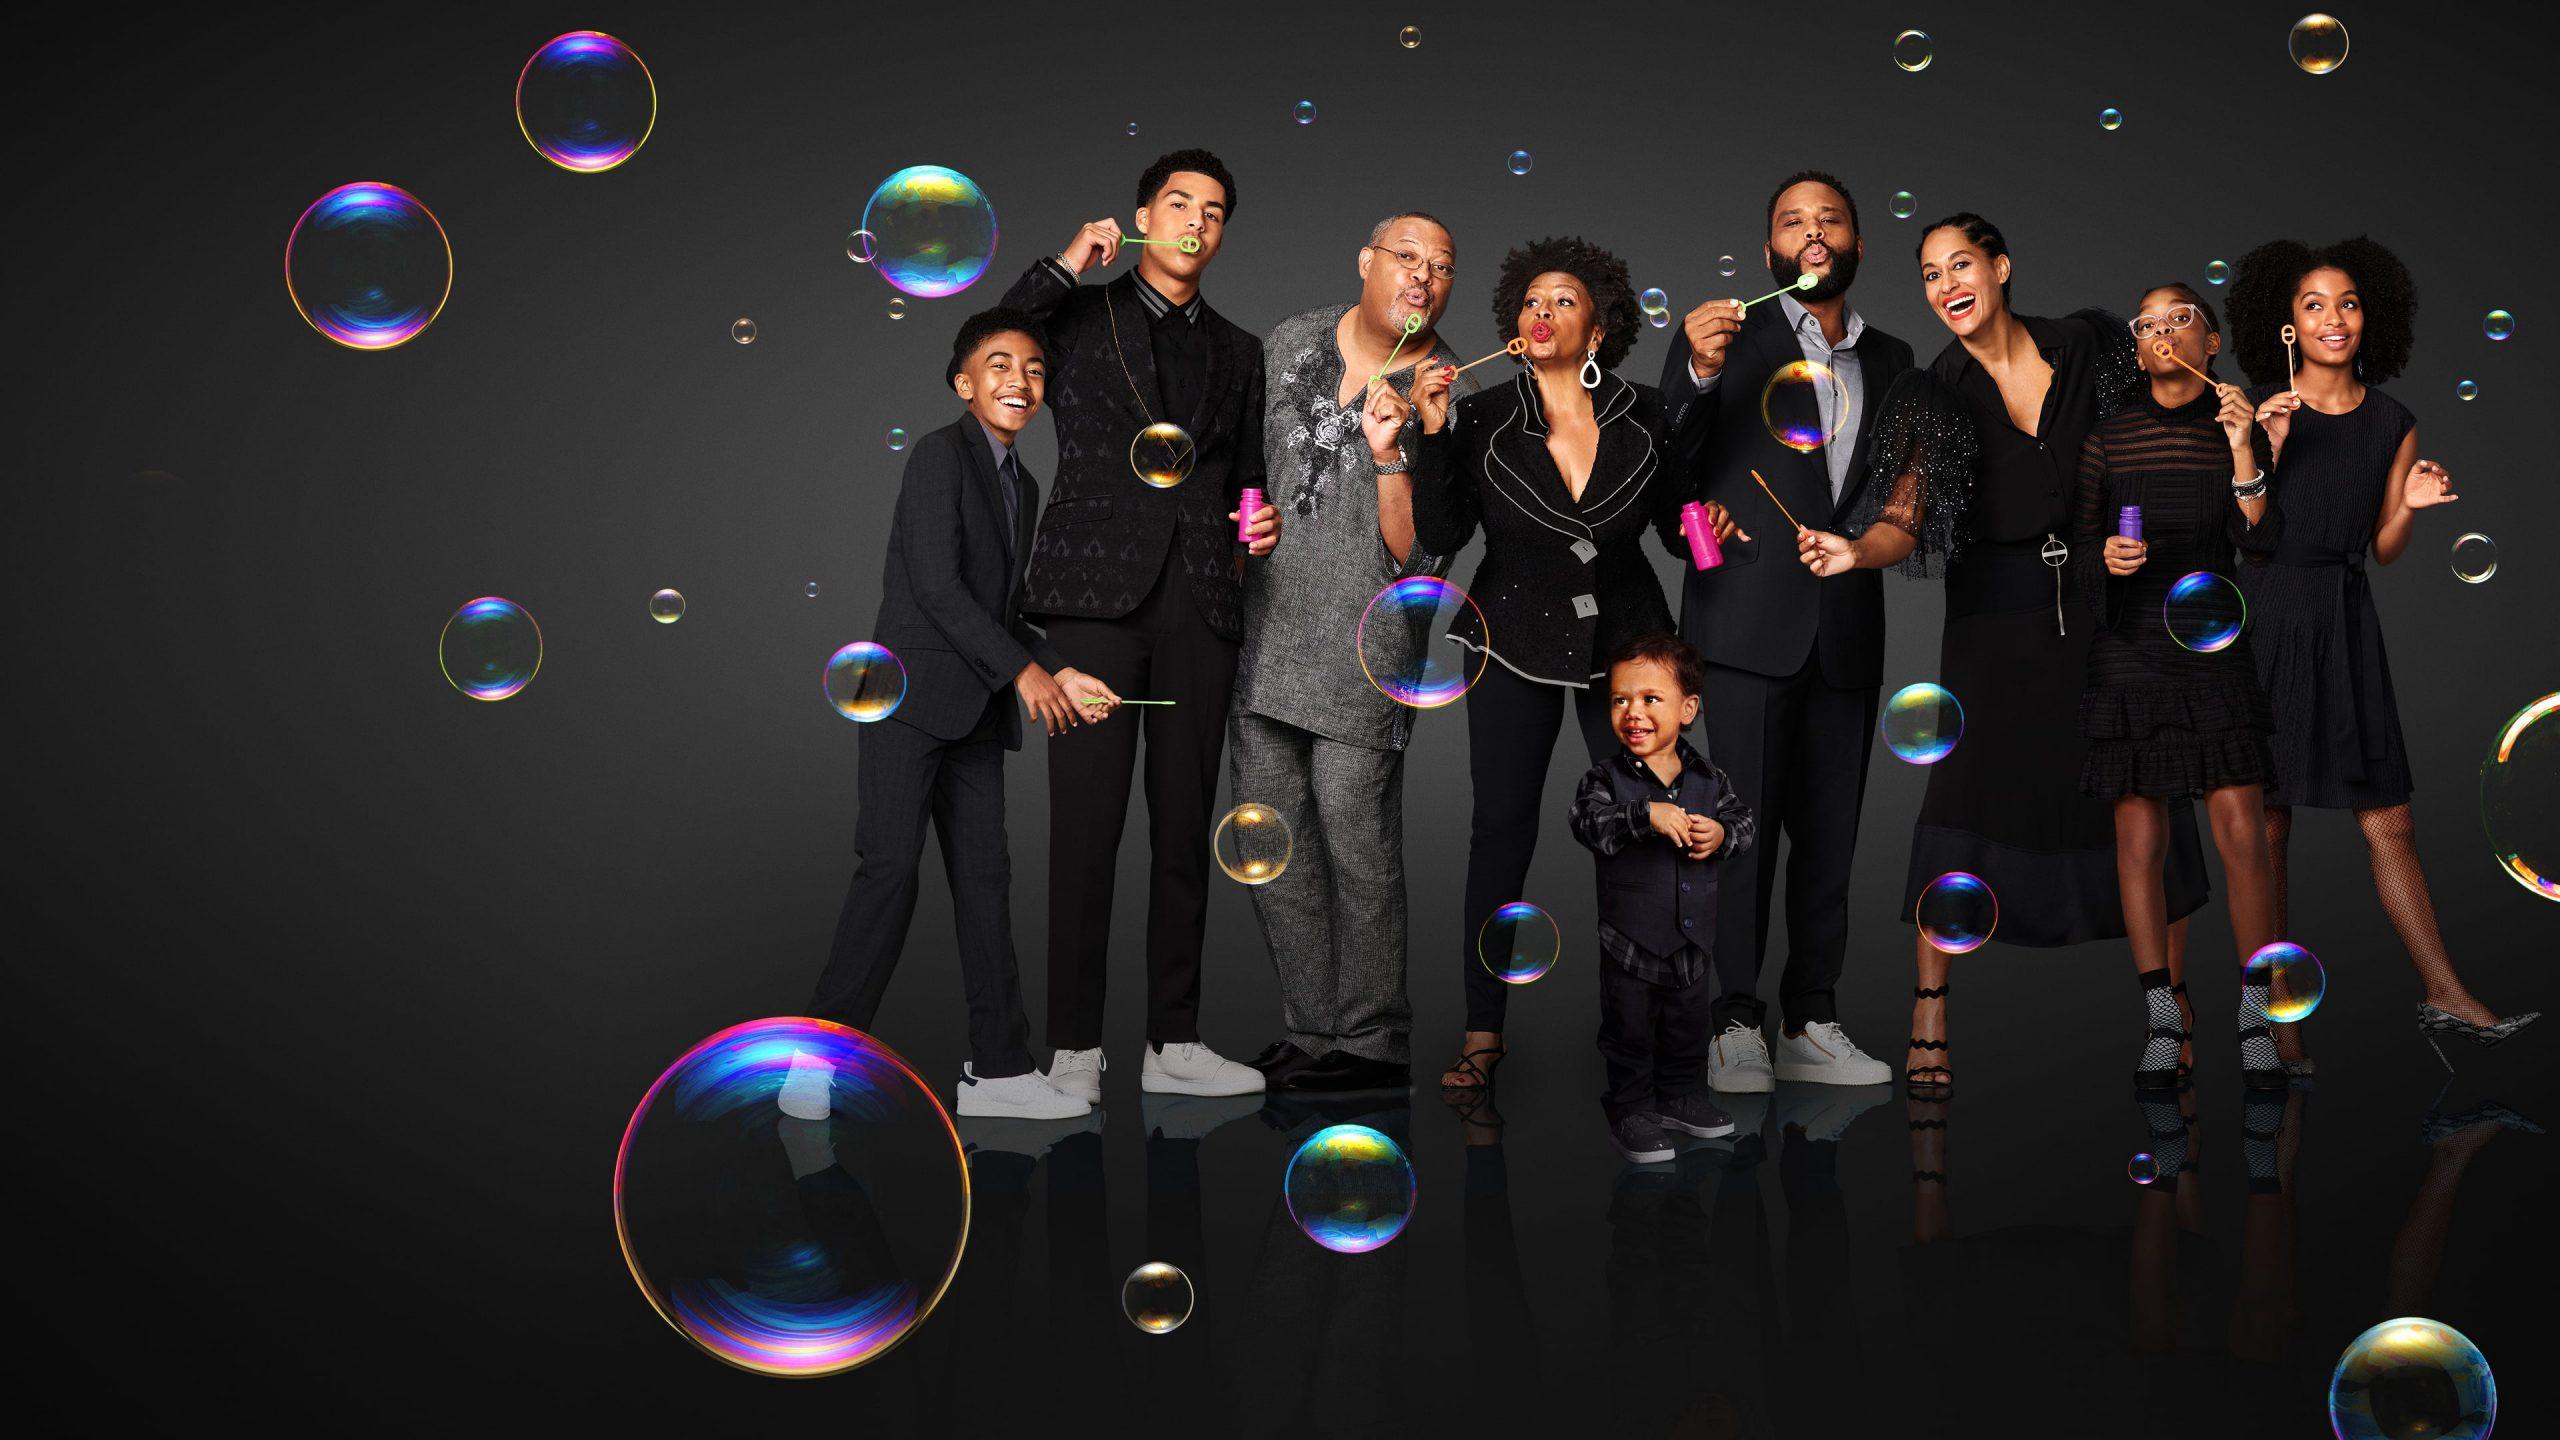 Black-ish Season 7 Episode 12 Release Date Revealed